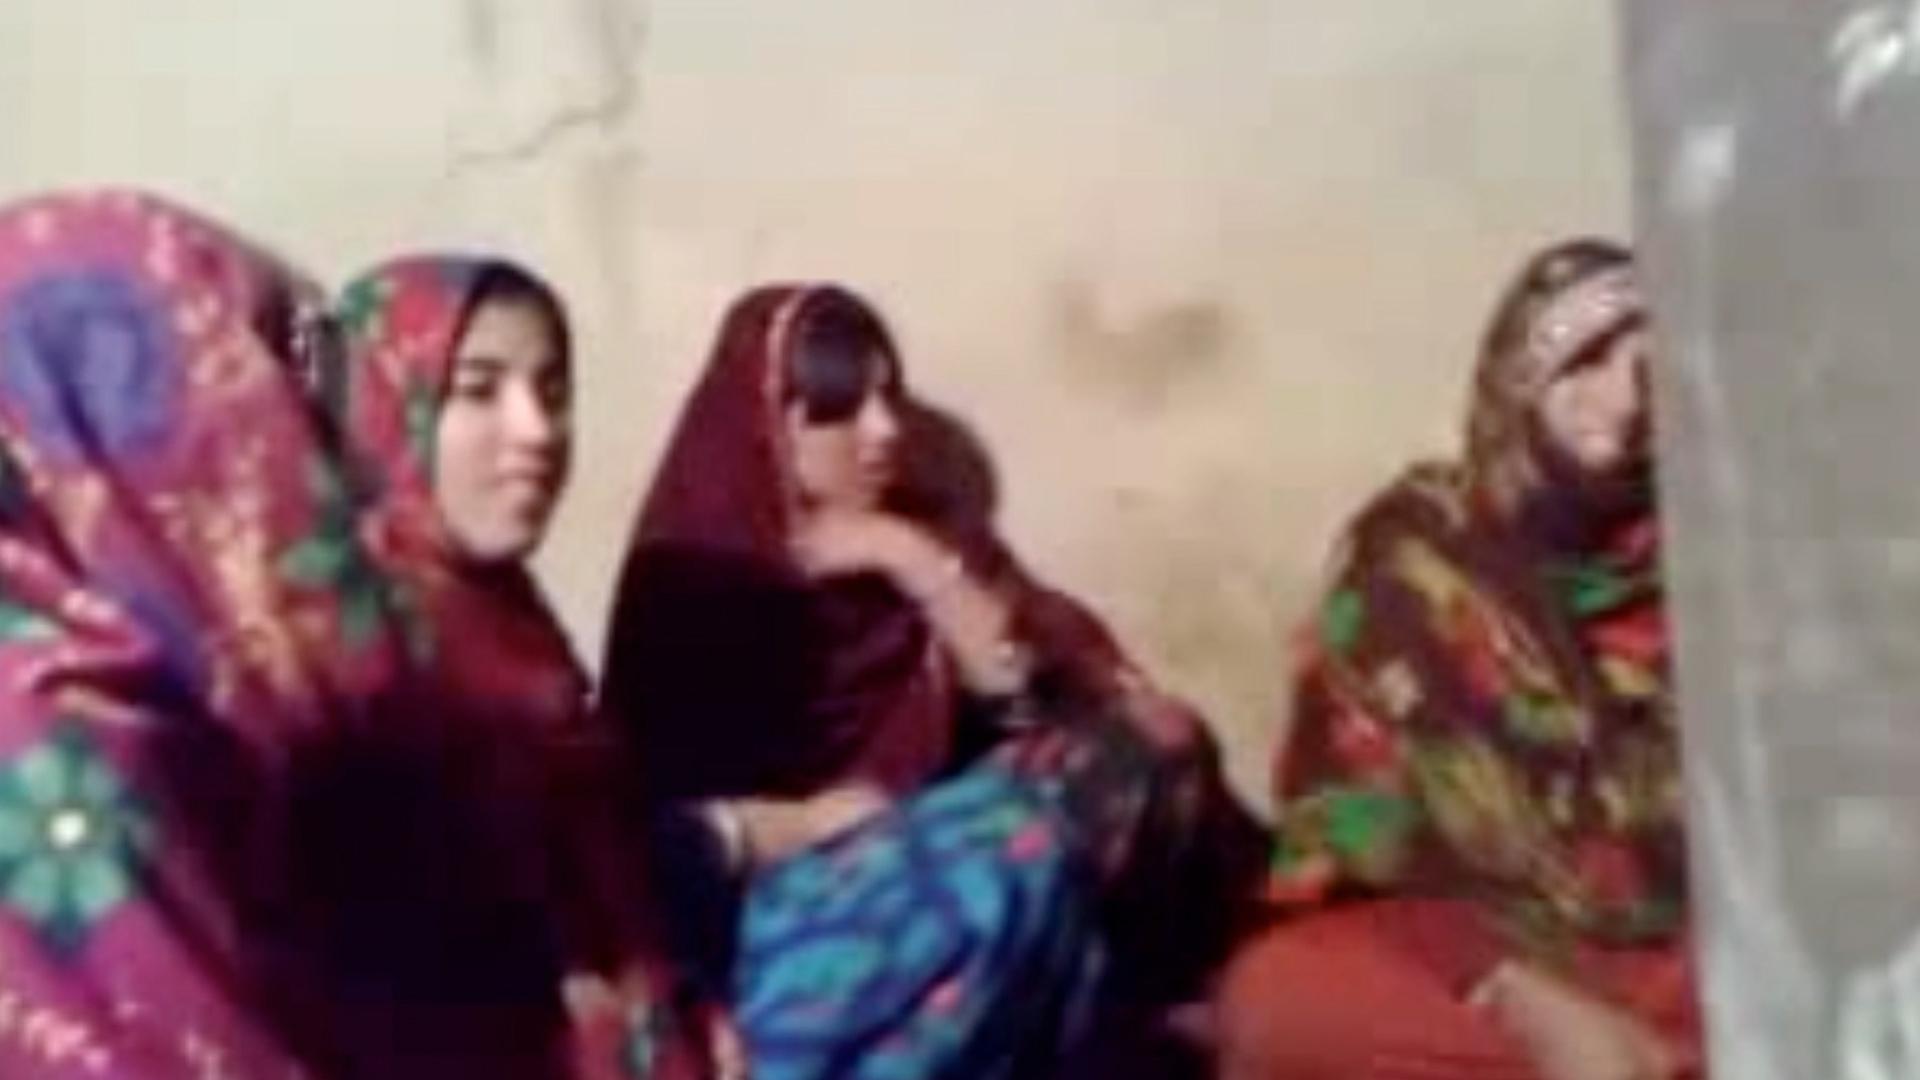 In Pakistan, five girls were killed for having fun. Then the story took an even darker twist.